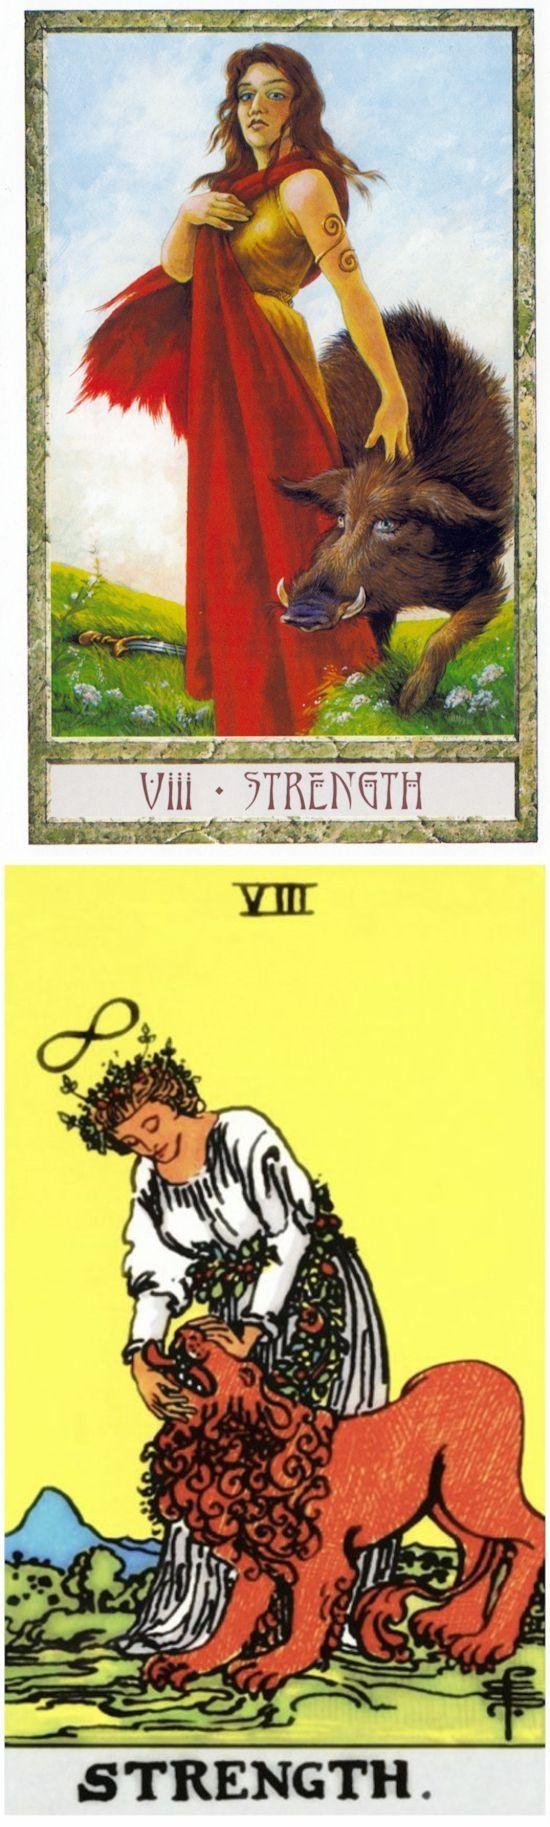 STRENGTH: bravery and self-doubt (reverse). Druid Craft Tarot deck and Rider Tarot deck: tarot card reading for today, tarotnano and how many tarot cards are there. Best 2017 tarot altar spiritual and ritual. #tarot #ios #androidapp